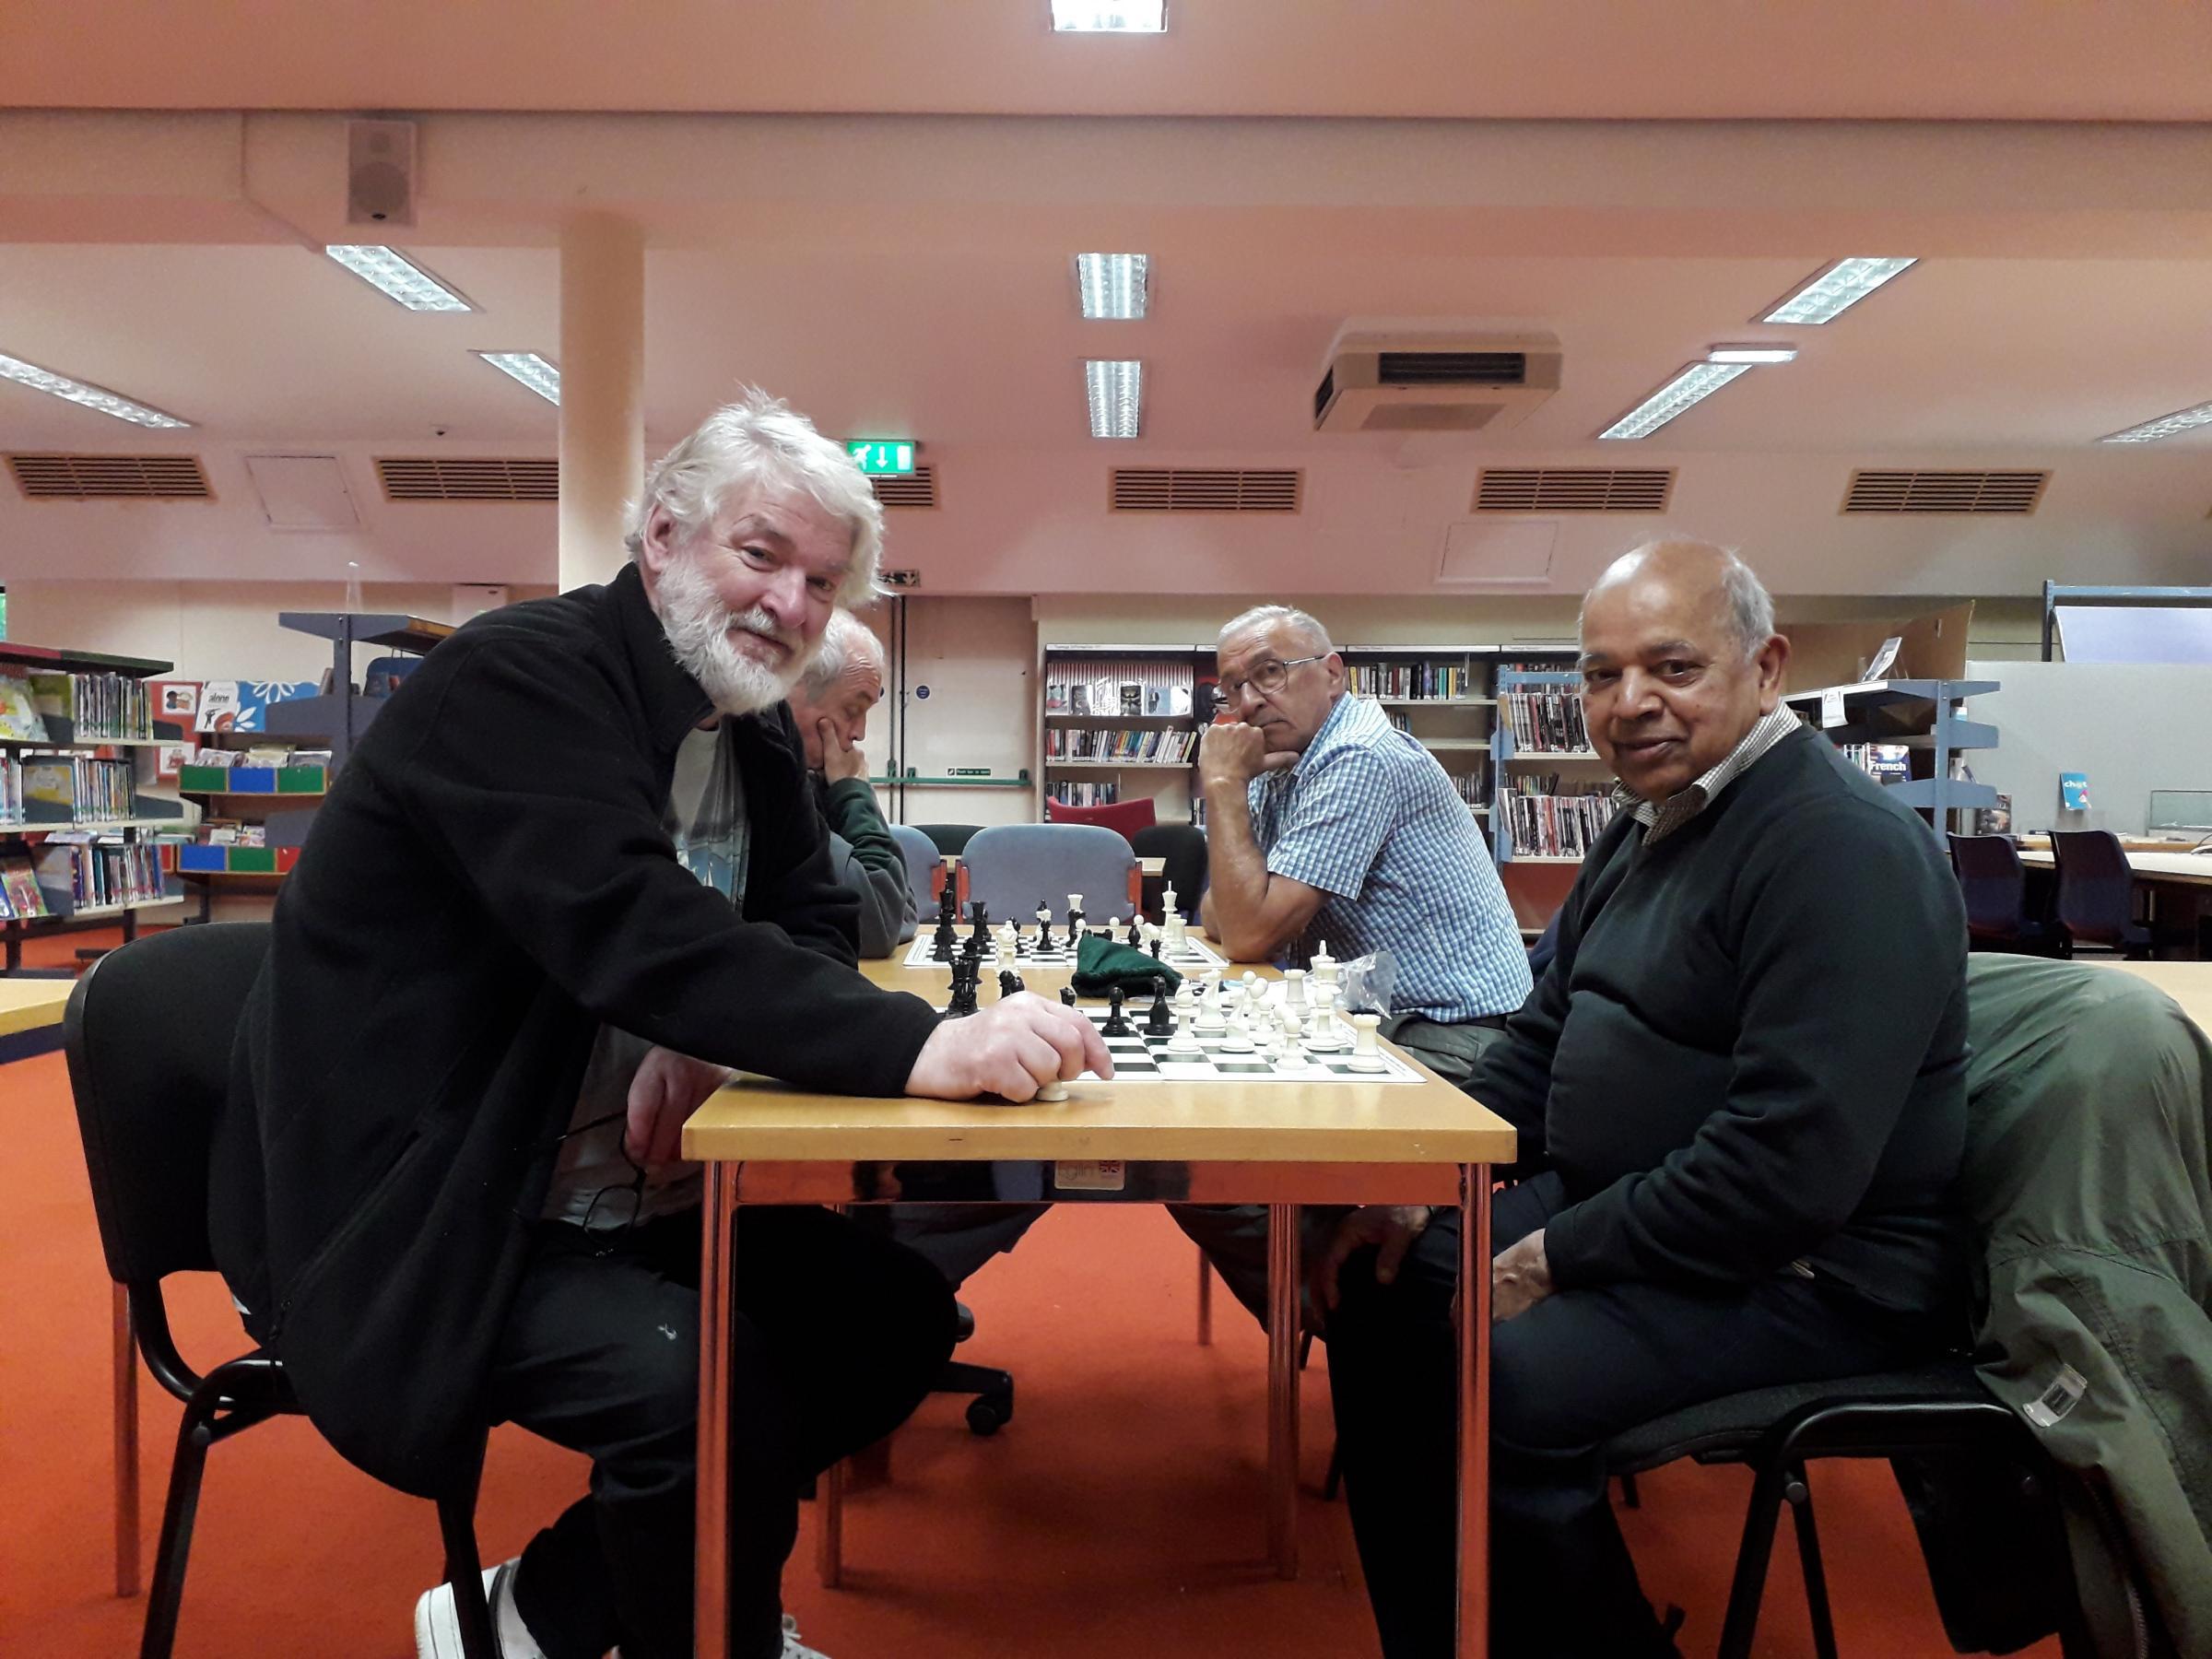 BIG INTERVIEW: Peter Richmond and Ramnik Mehta of Swindon's Community Chess Club